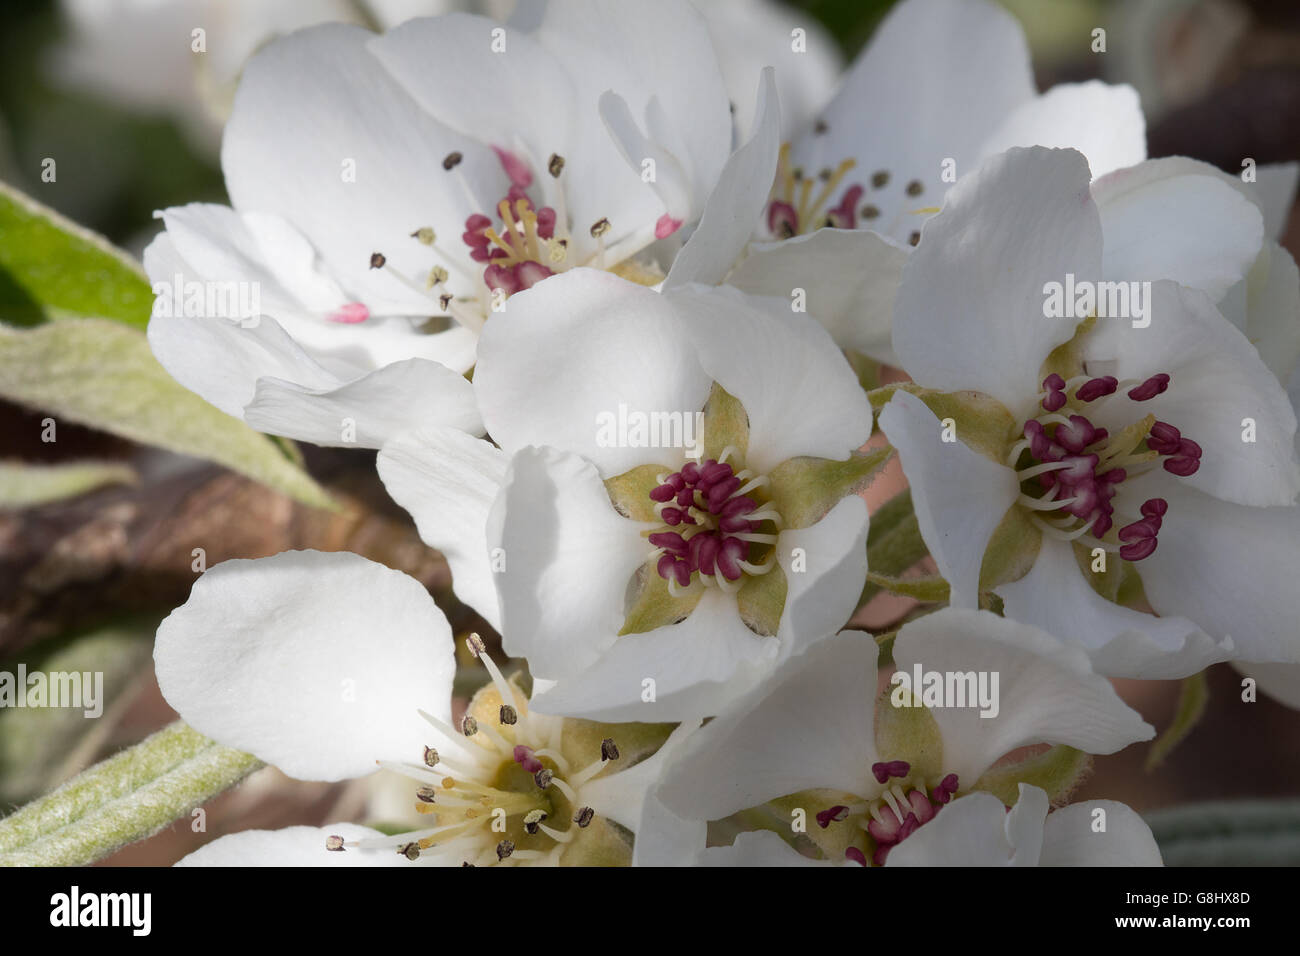 Mehrere Birnenblüten im Frühling, Makro  Several Pear blossom in spring, macro - Stock Image